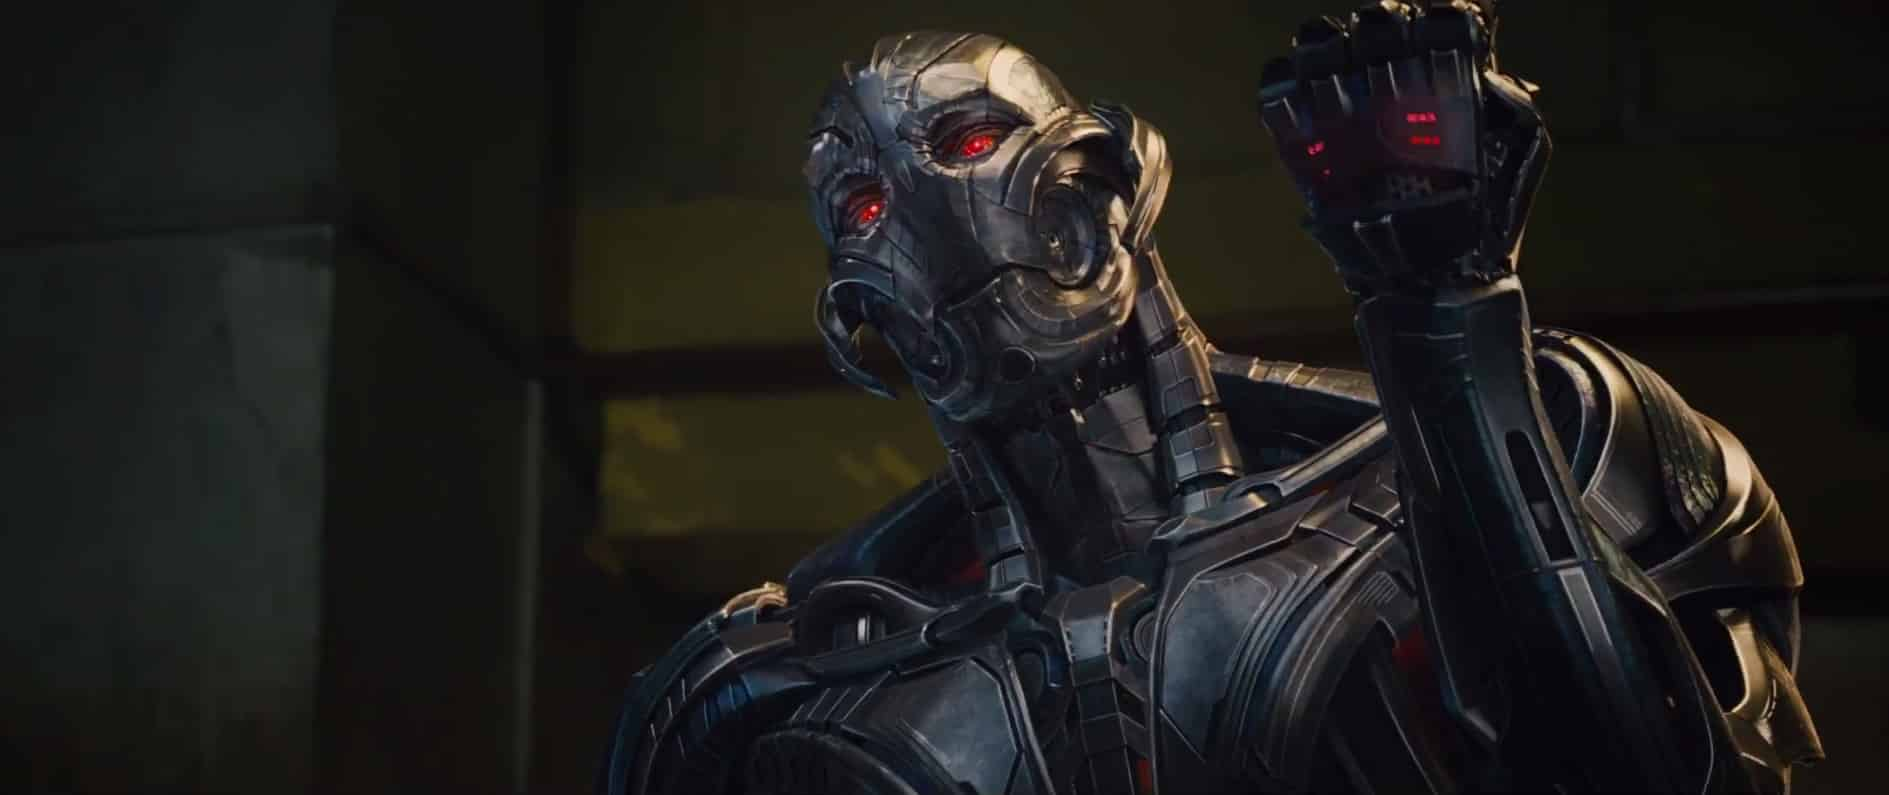 Ultron Marvel MCU Age of Ultron